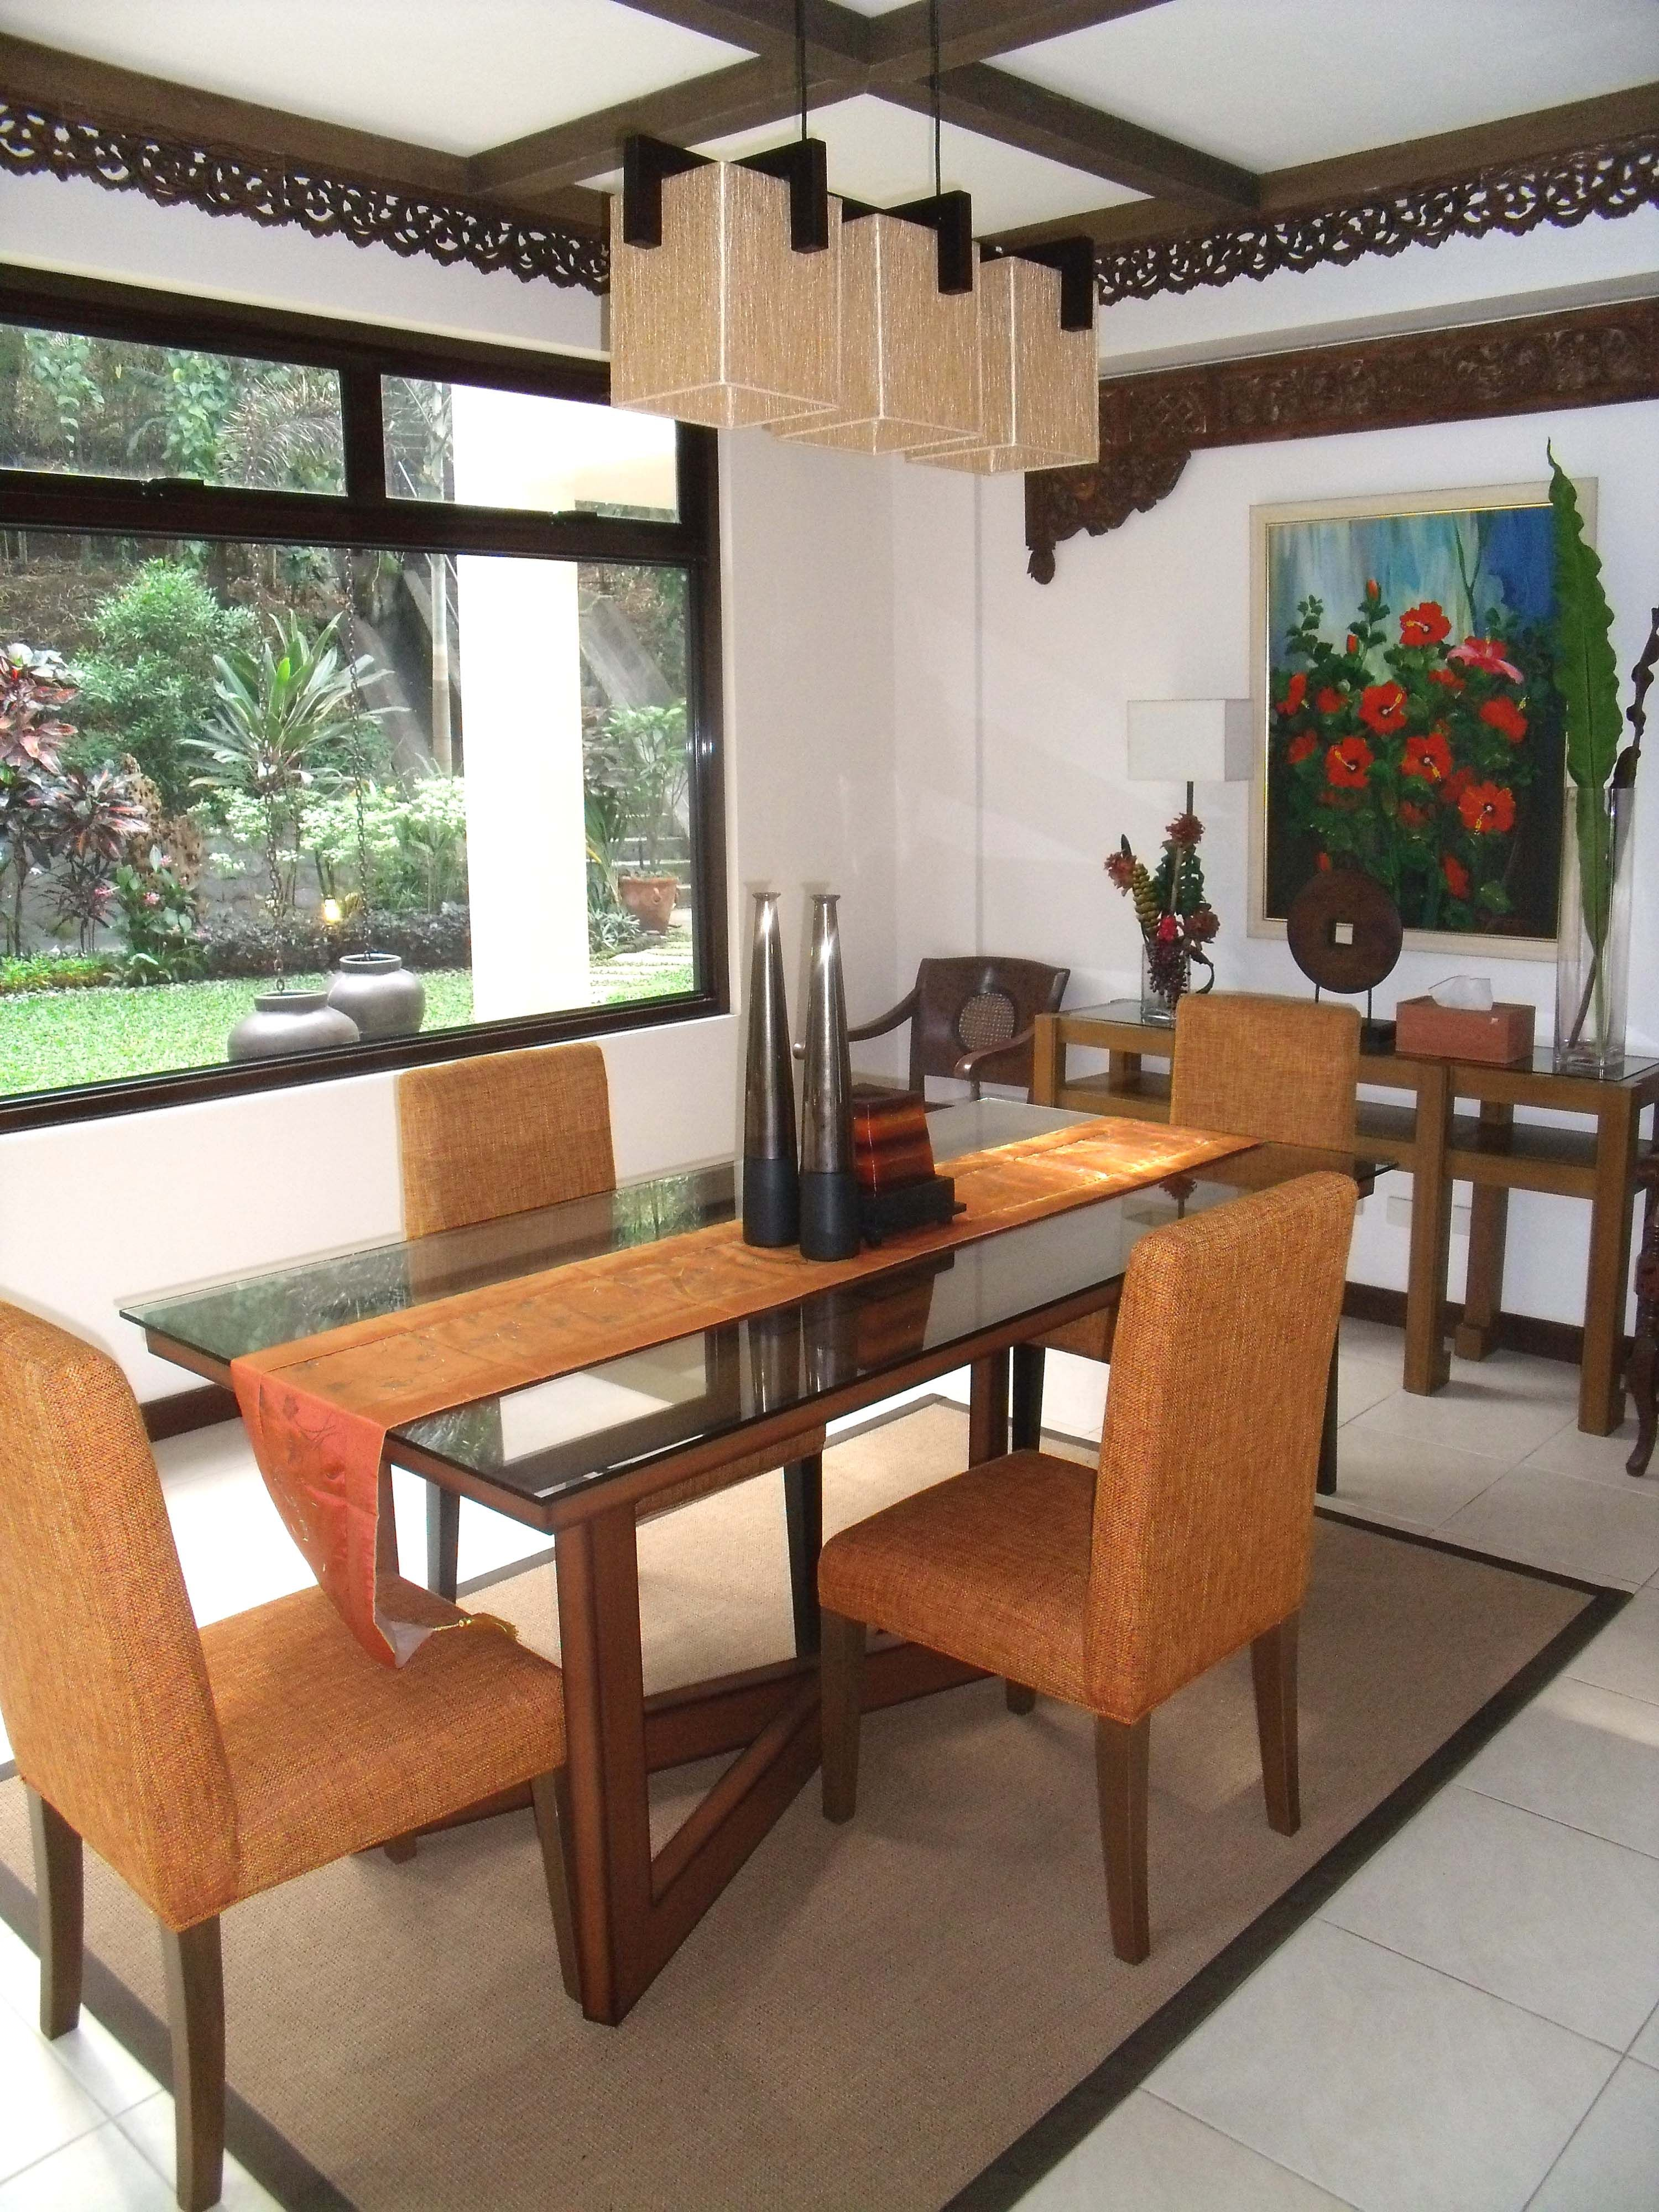 Interior Design Of Dining Room: Balinese Inspired Dining Room By RVR Interior Design